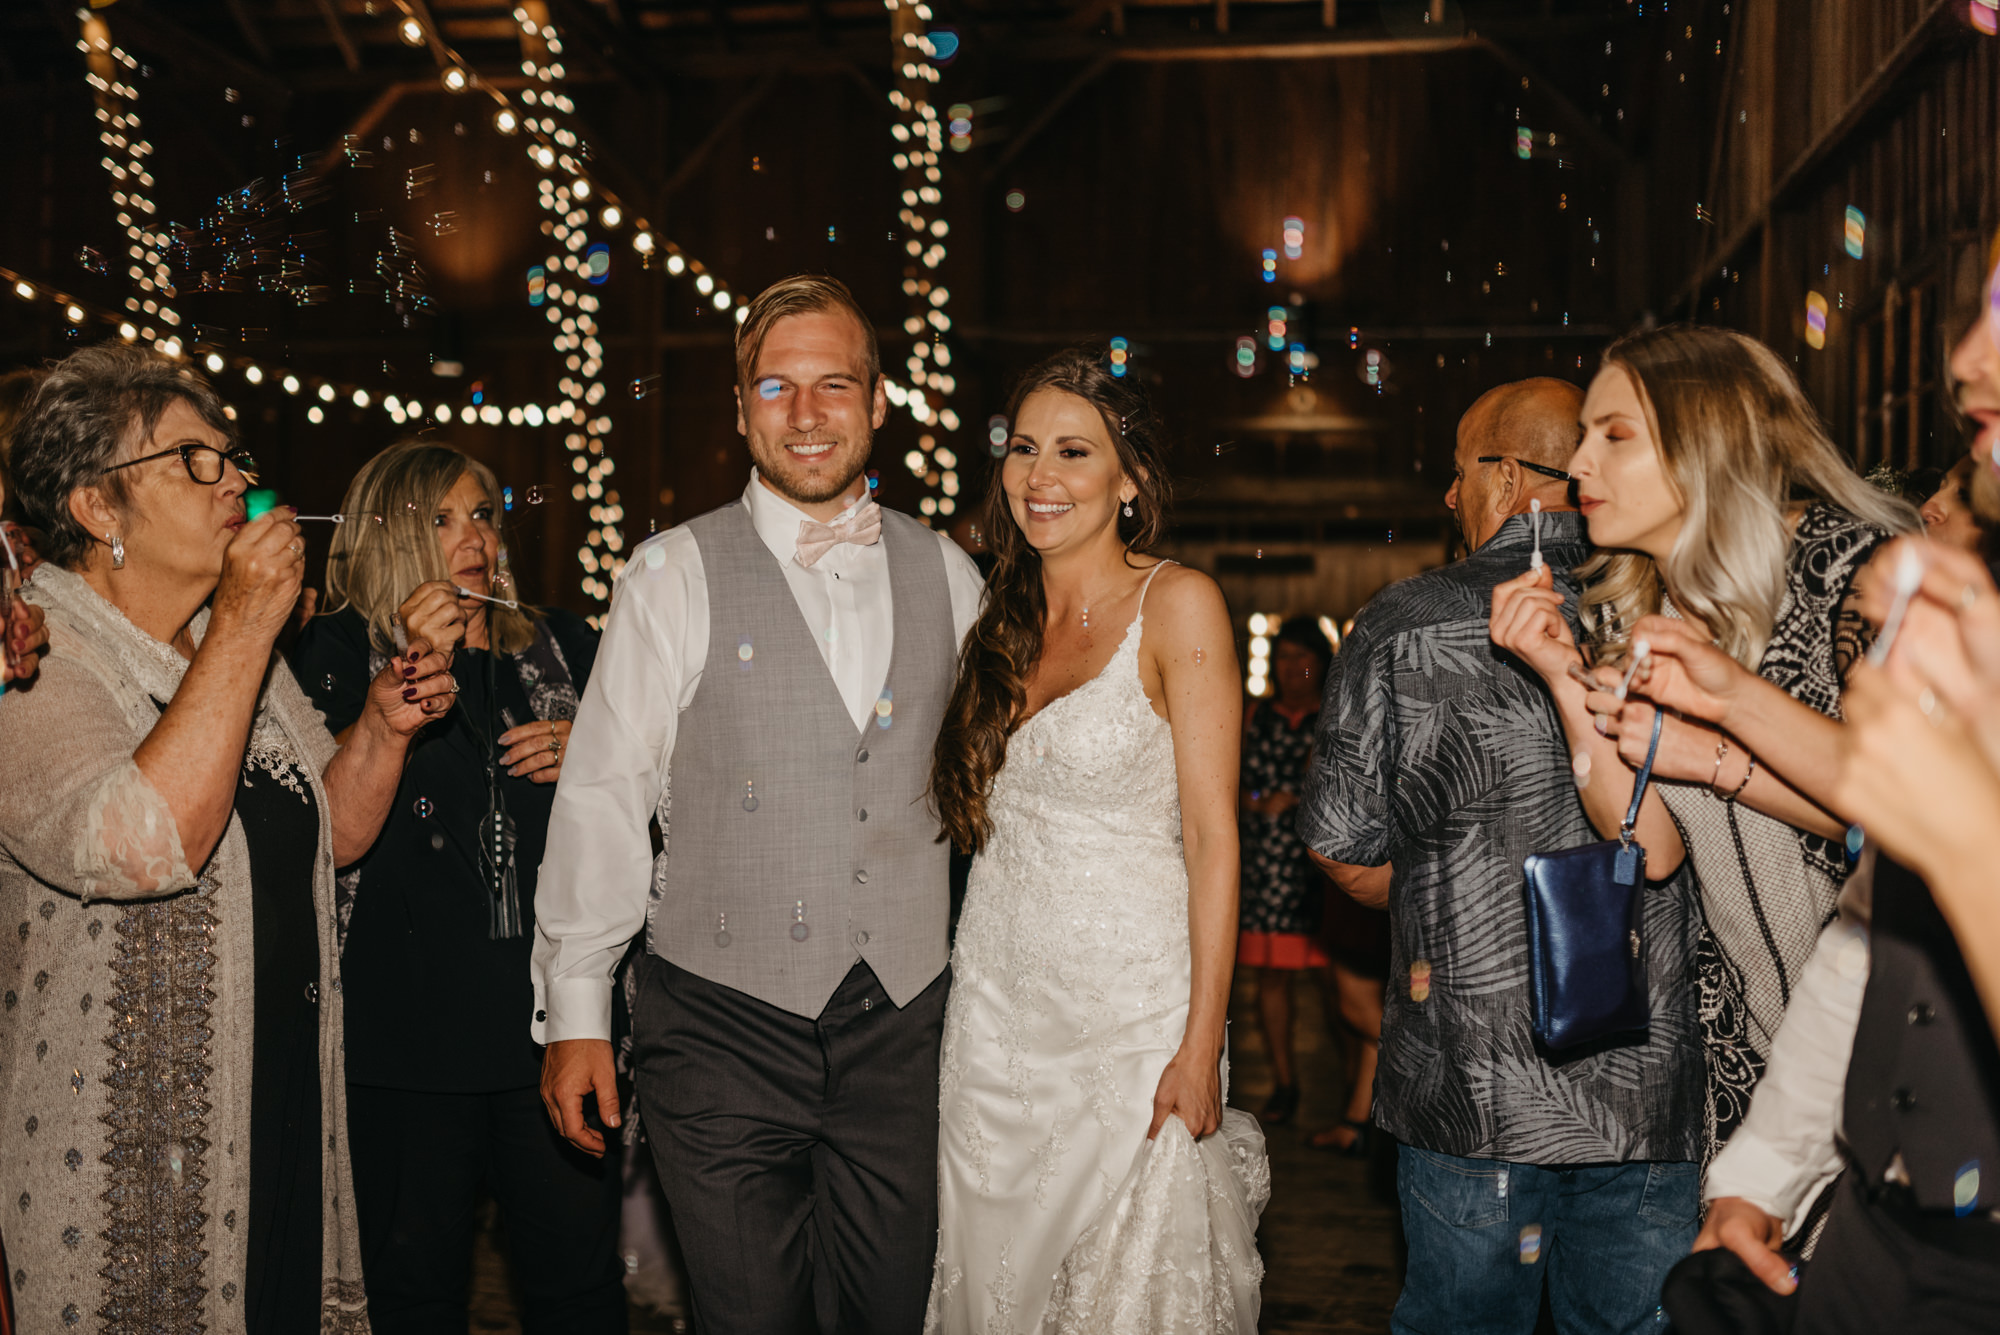 223-portland-northwest-wedding-bubble-exit-barn-string-lights.jpg